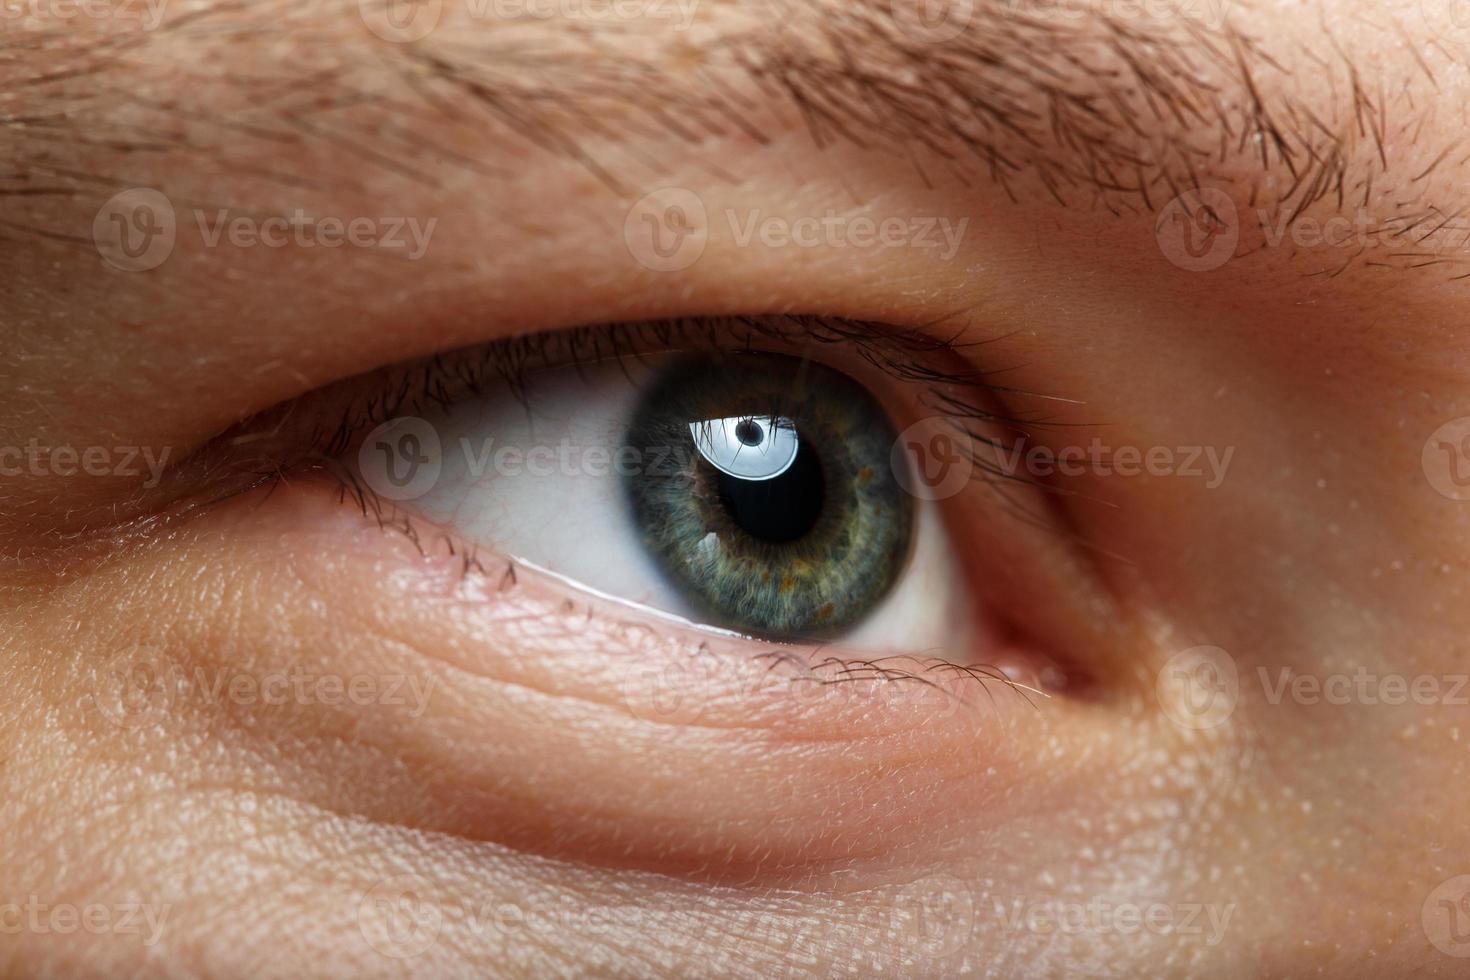 manlig höger grönt öga extrem närbild foto